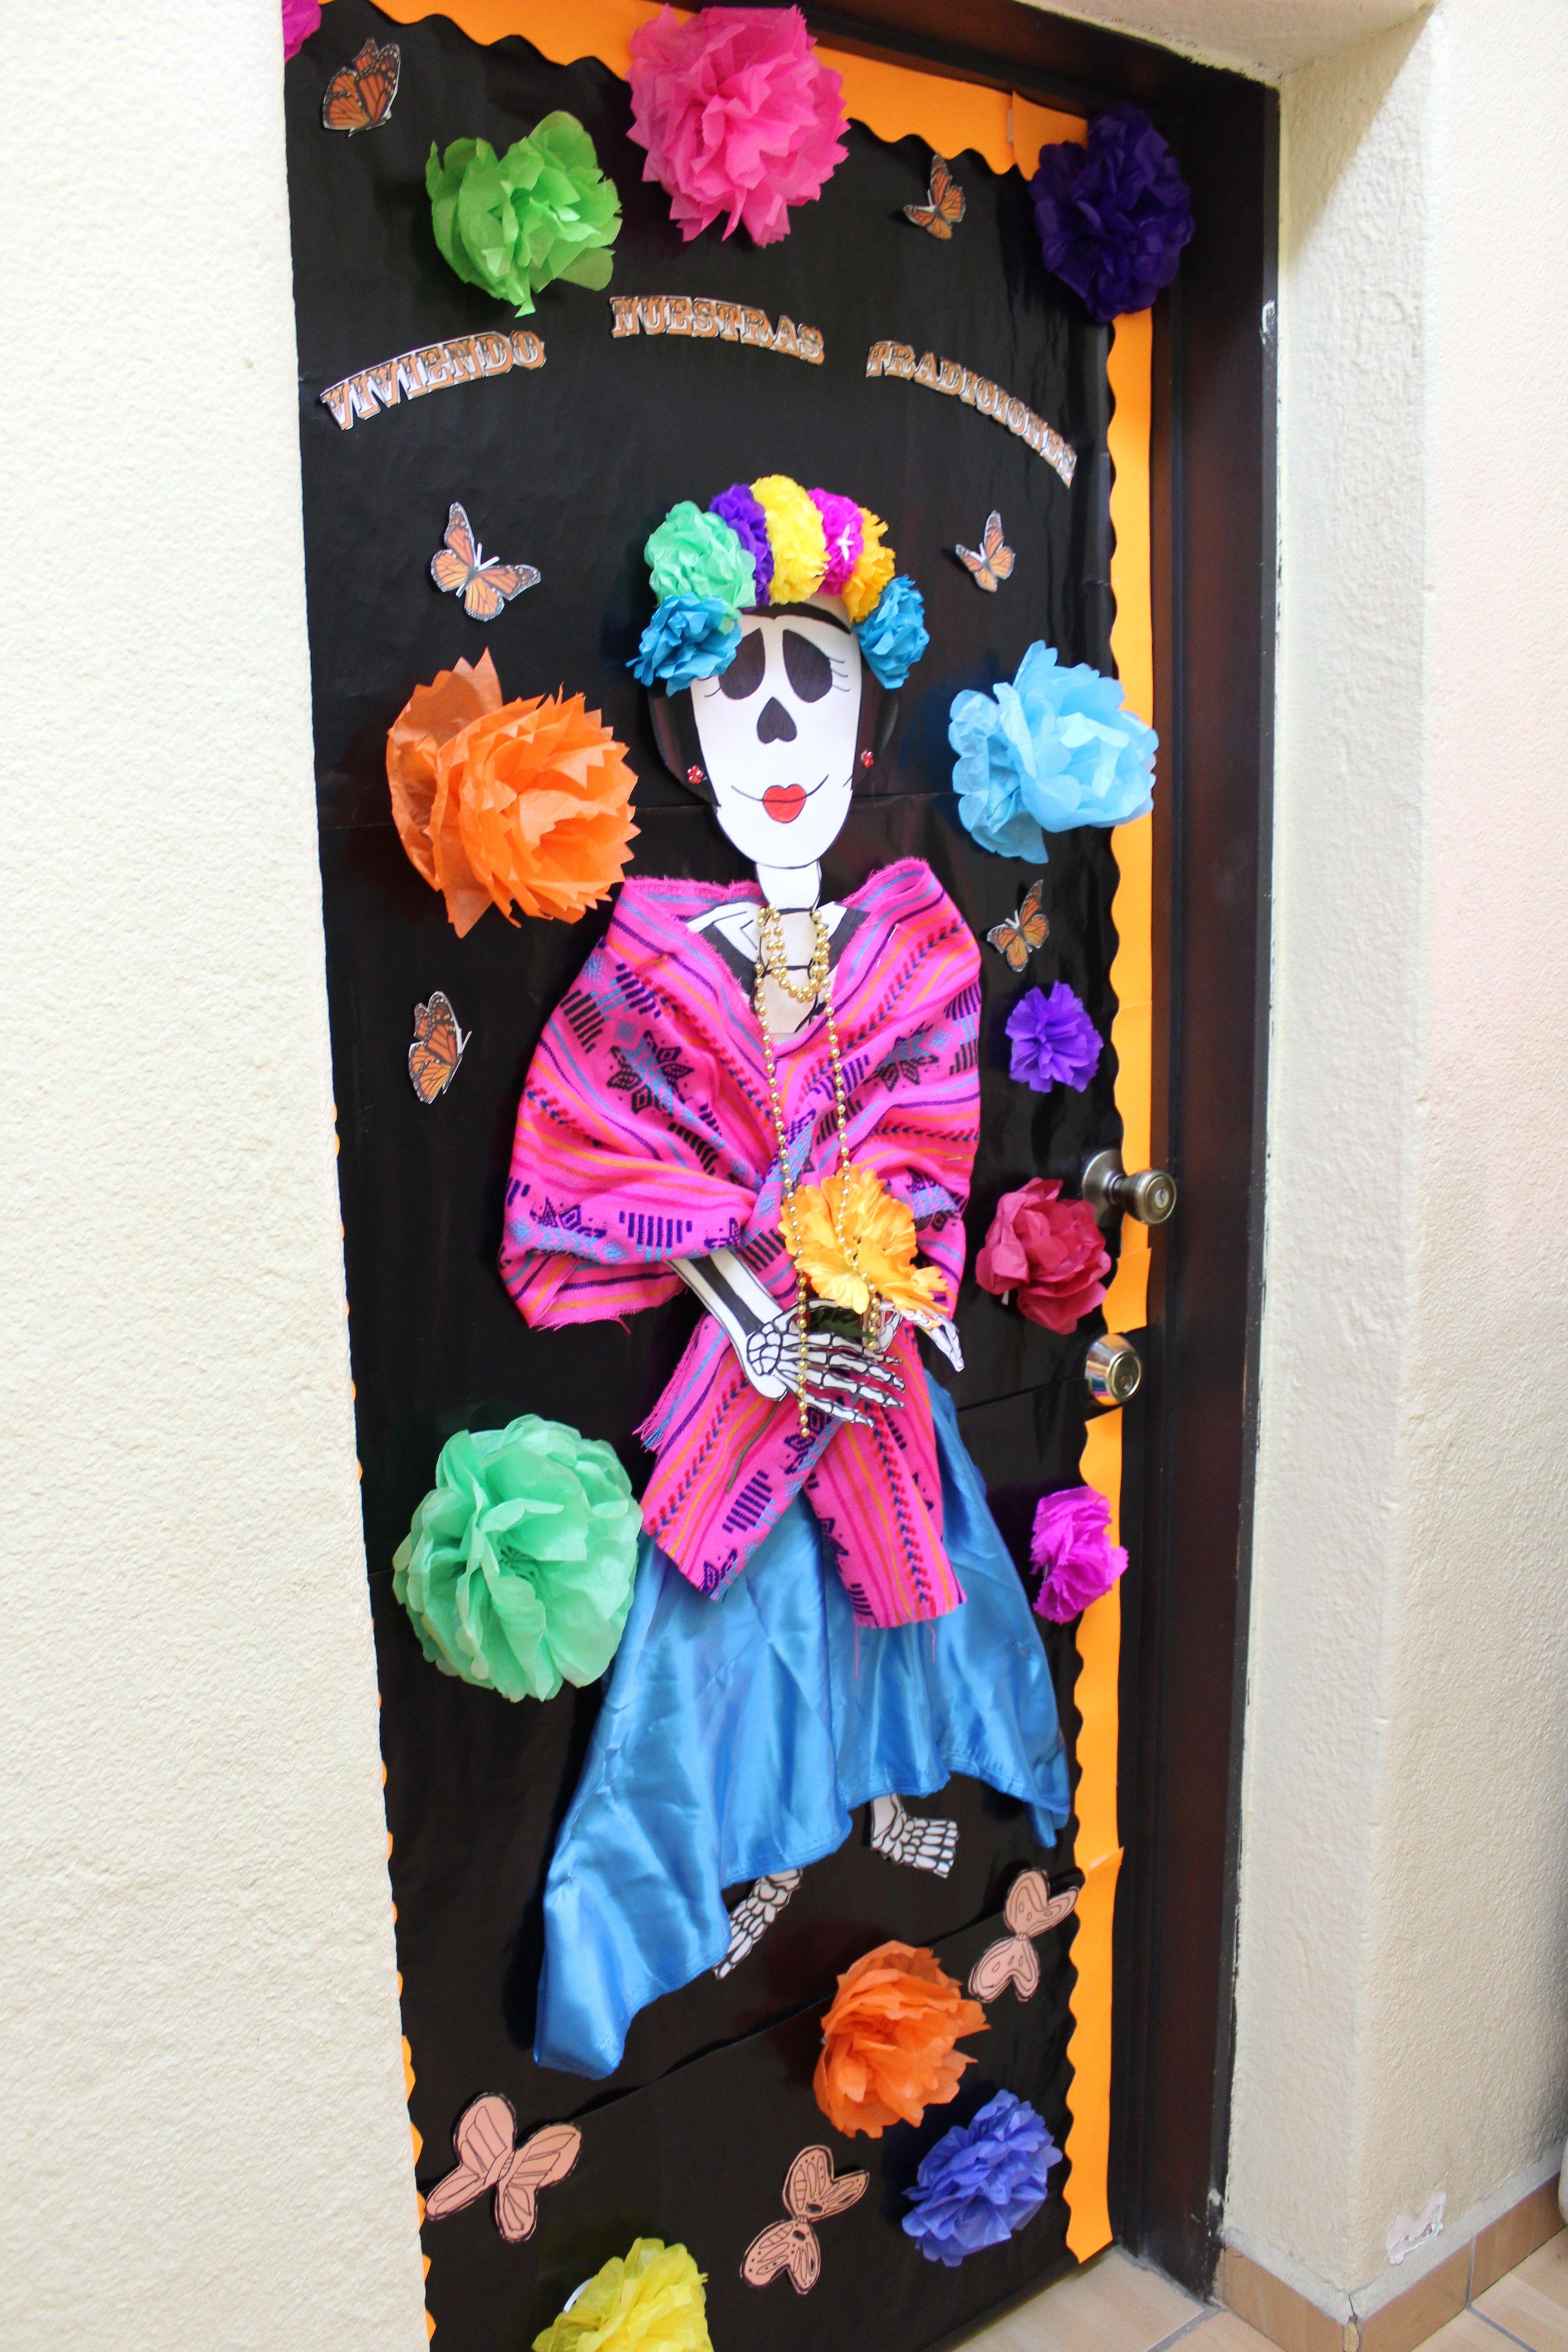 Dia de muertos puertas decoradas school die day dia de for Decoracion de puertas de dia de muertos